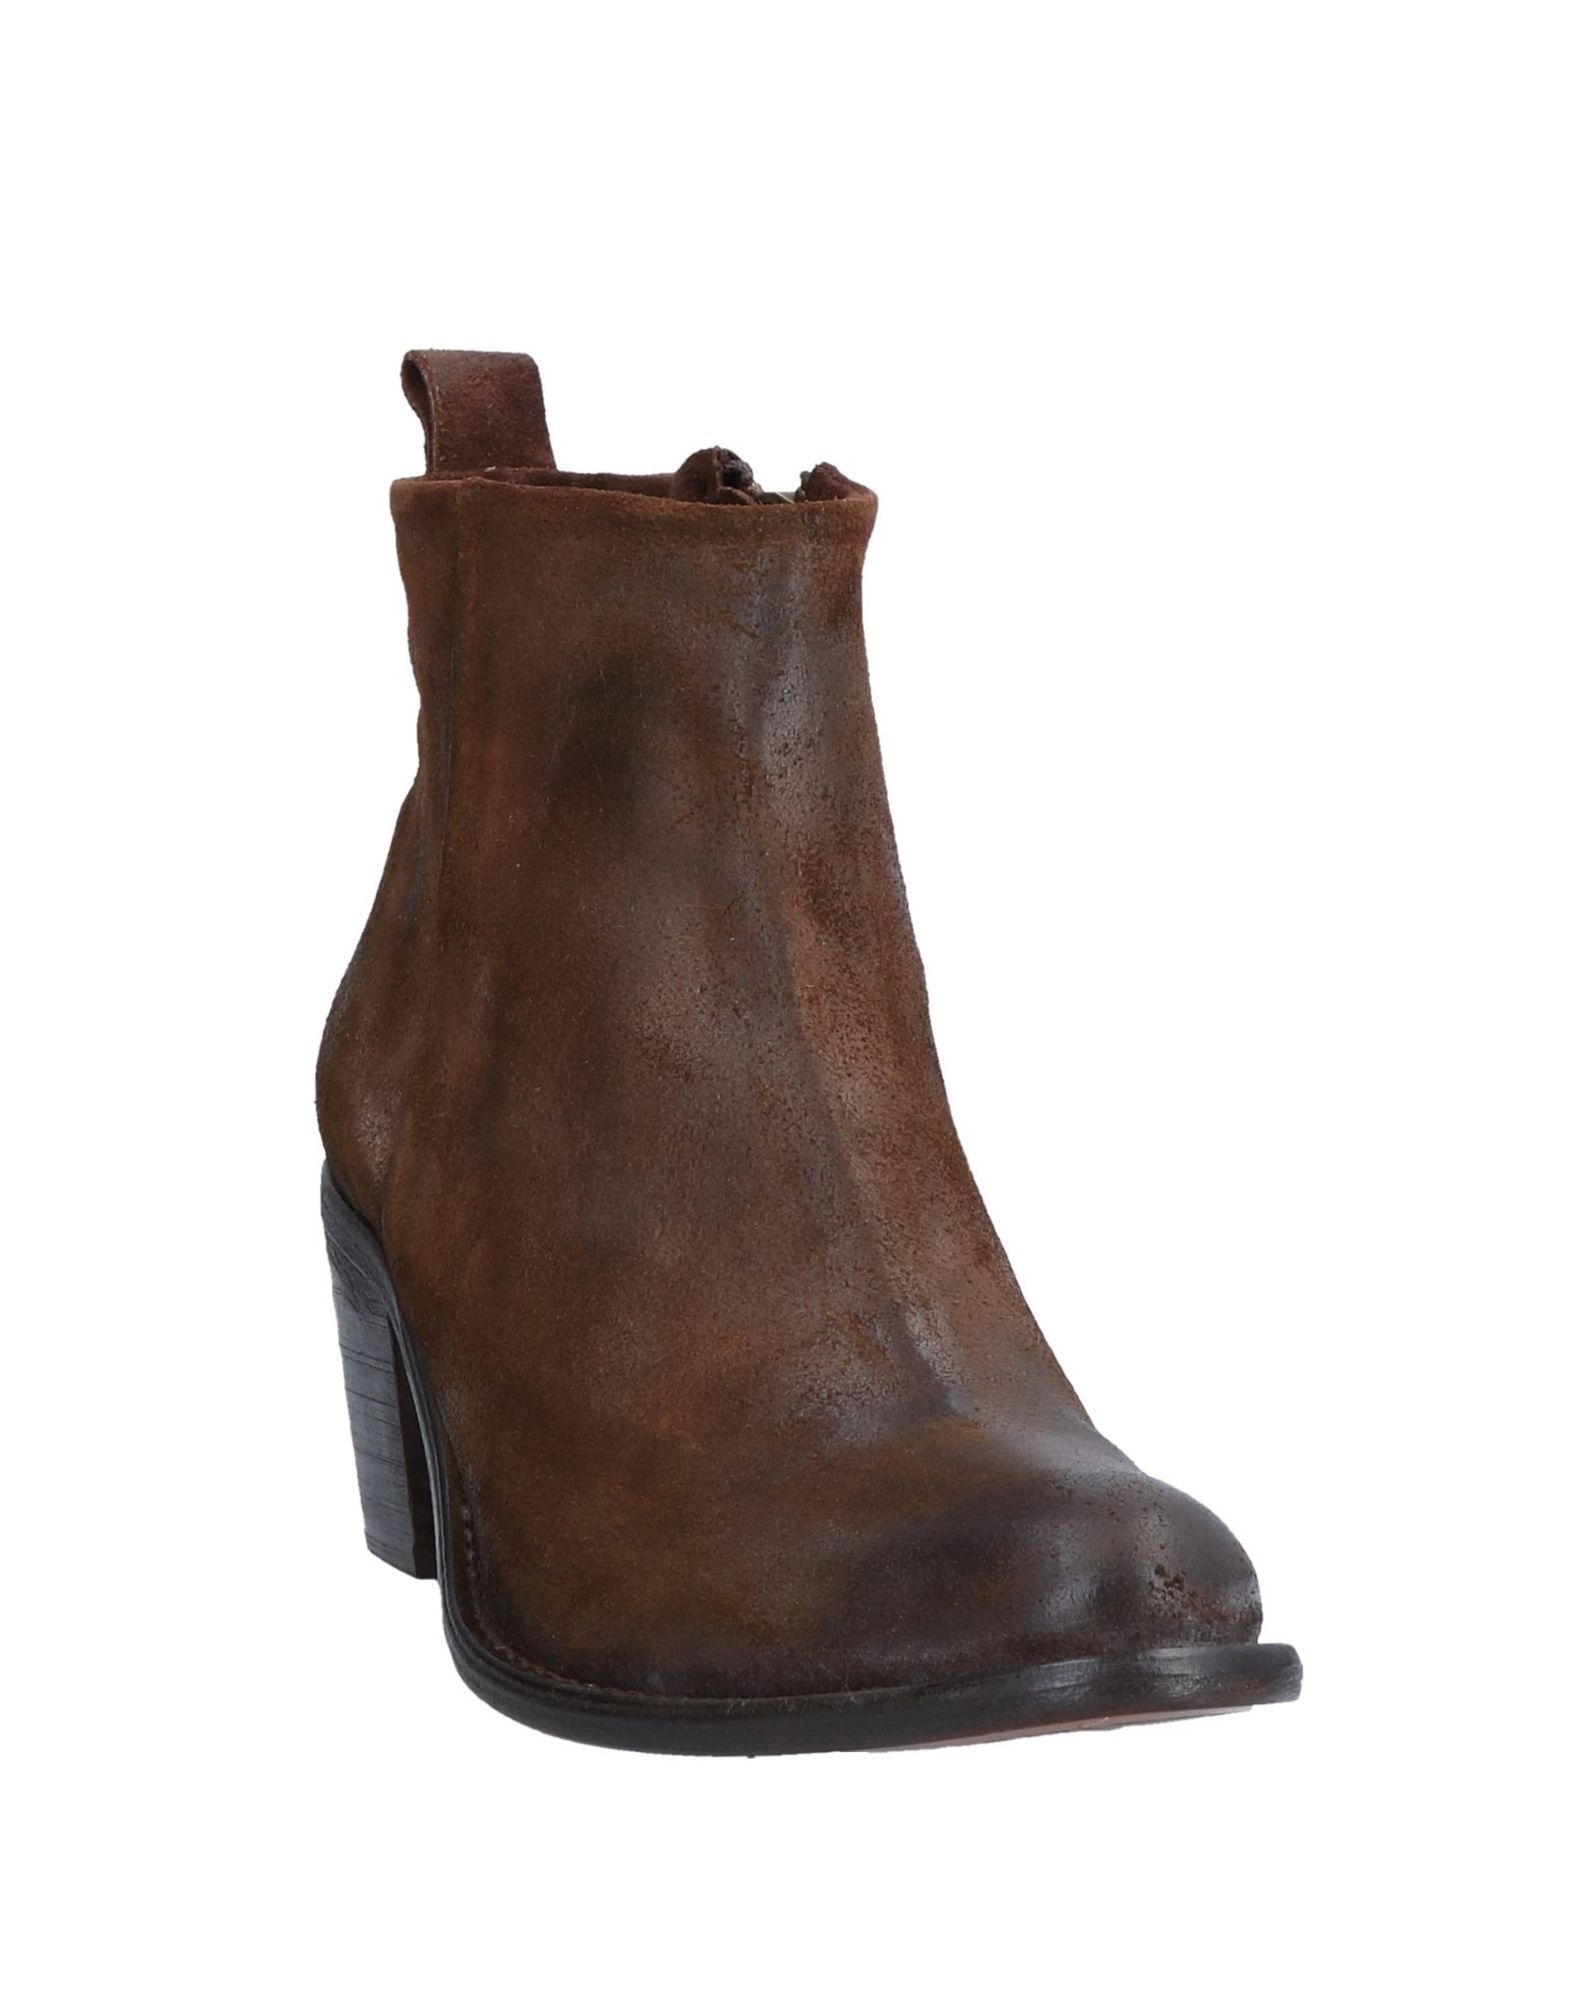 Diesel Dark Brown Leather Ankle Boots